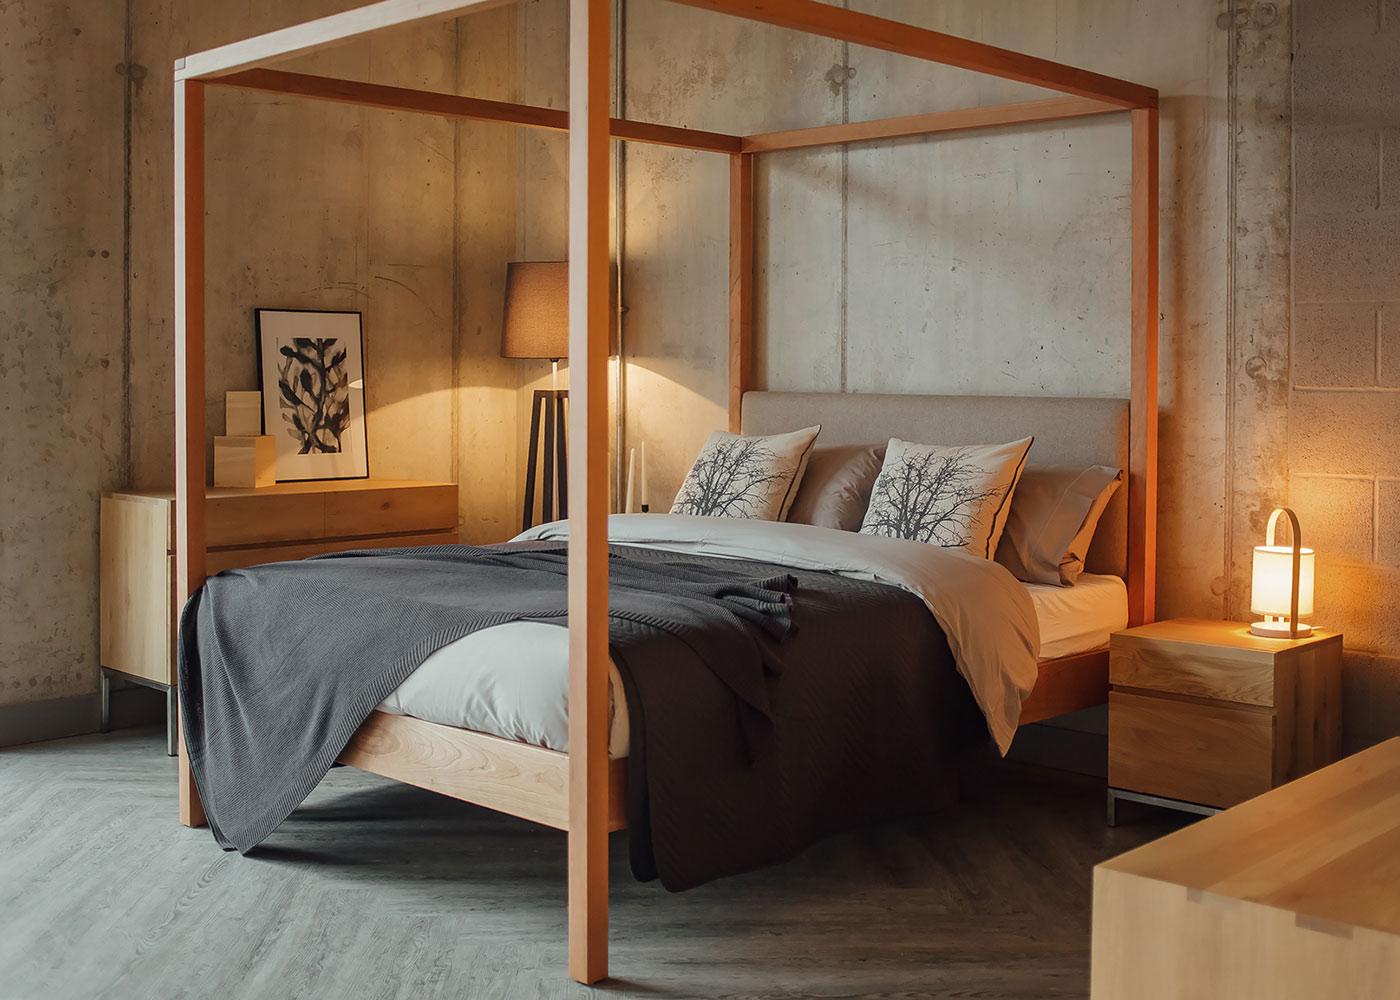 Highland-upholstered-4-poster